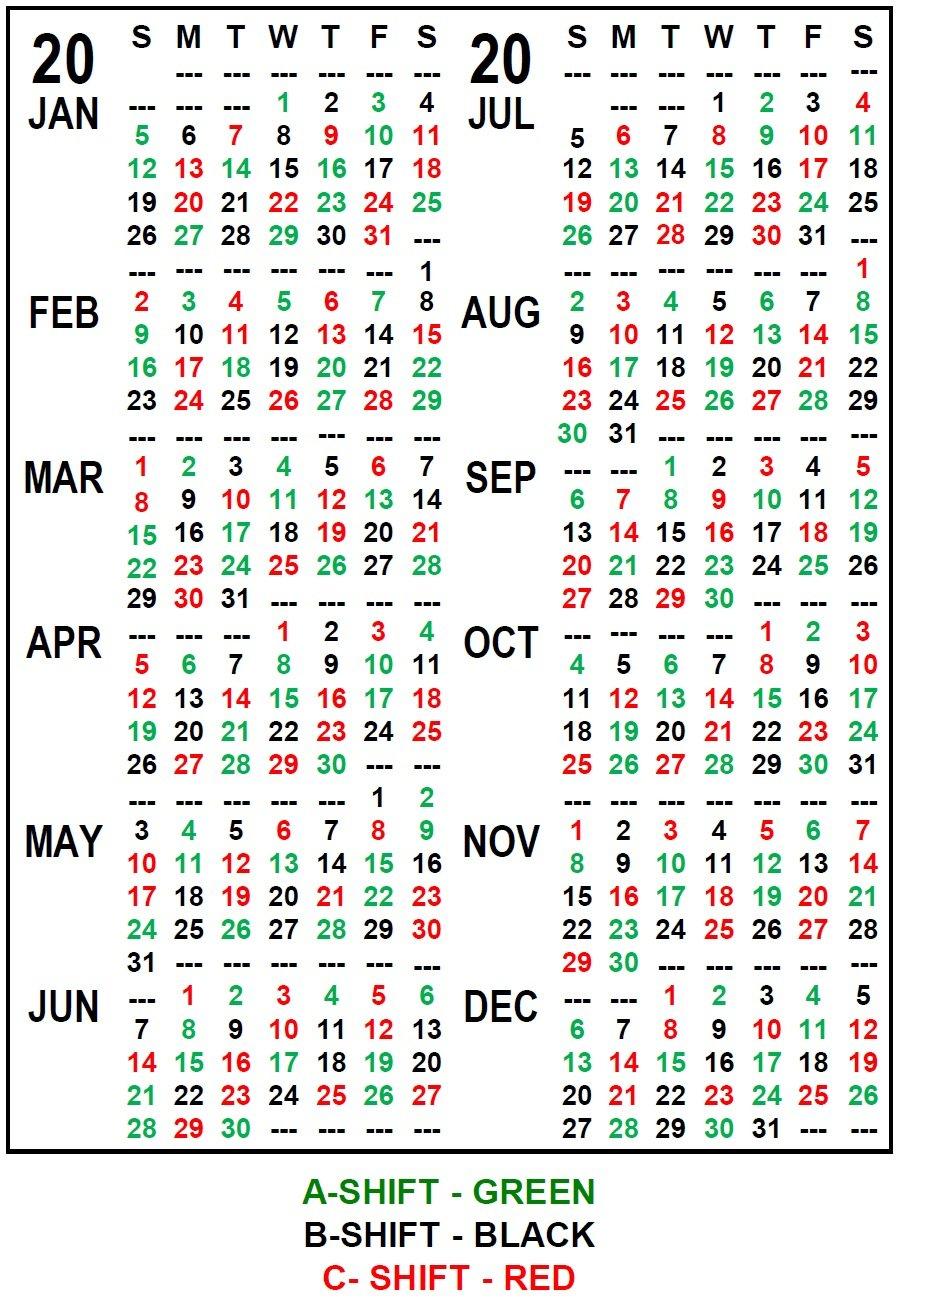 Firefighter Shift Schedule Tool :-Free Calendar Template intended for Jfrd 2022 Shift Calendar